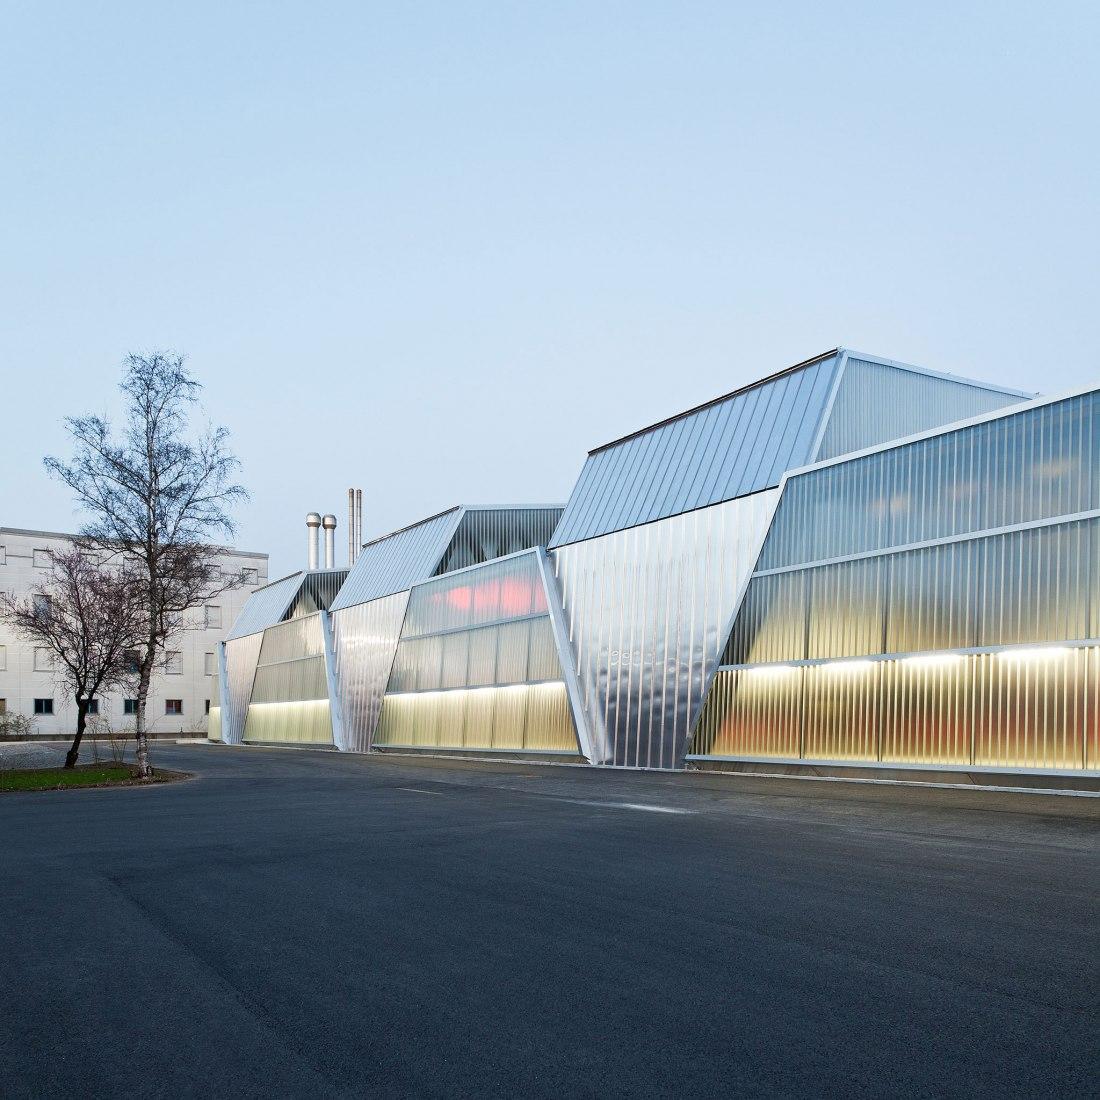 Berna Tramdepot de Penzel Architects. Fotografía de © Marcela Grassi